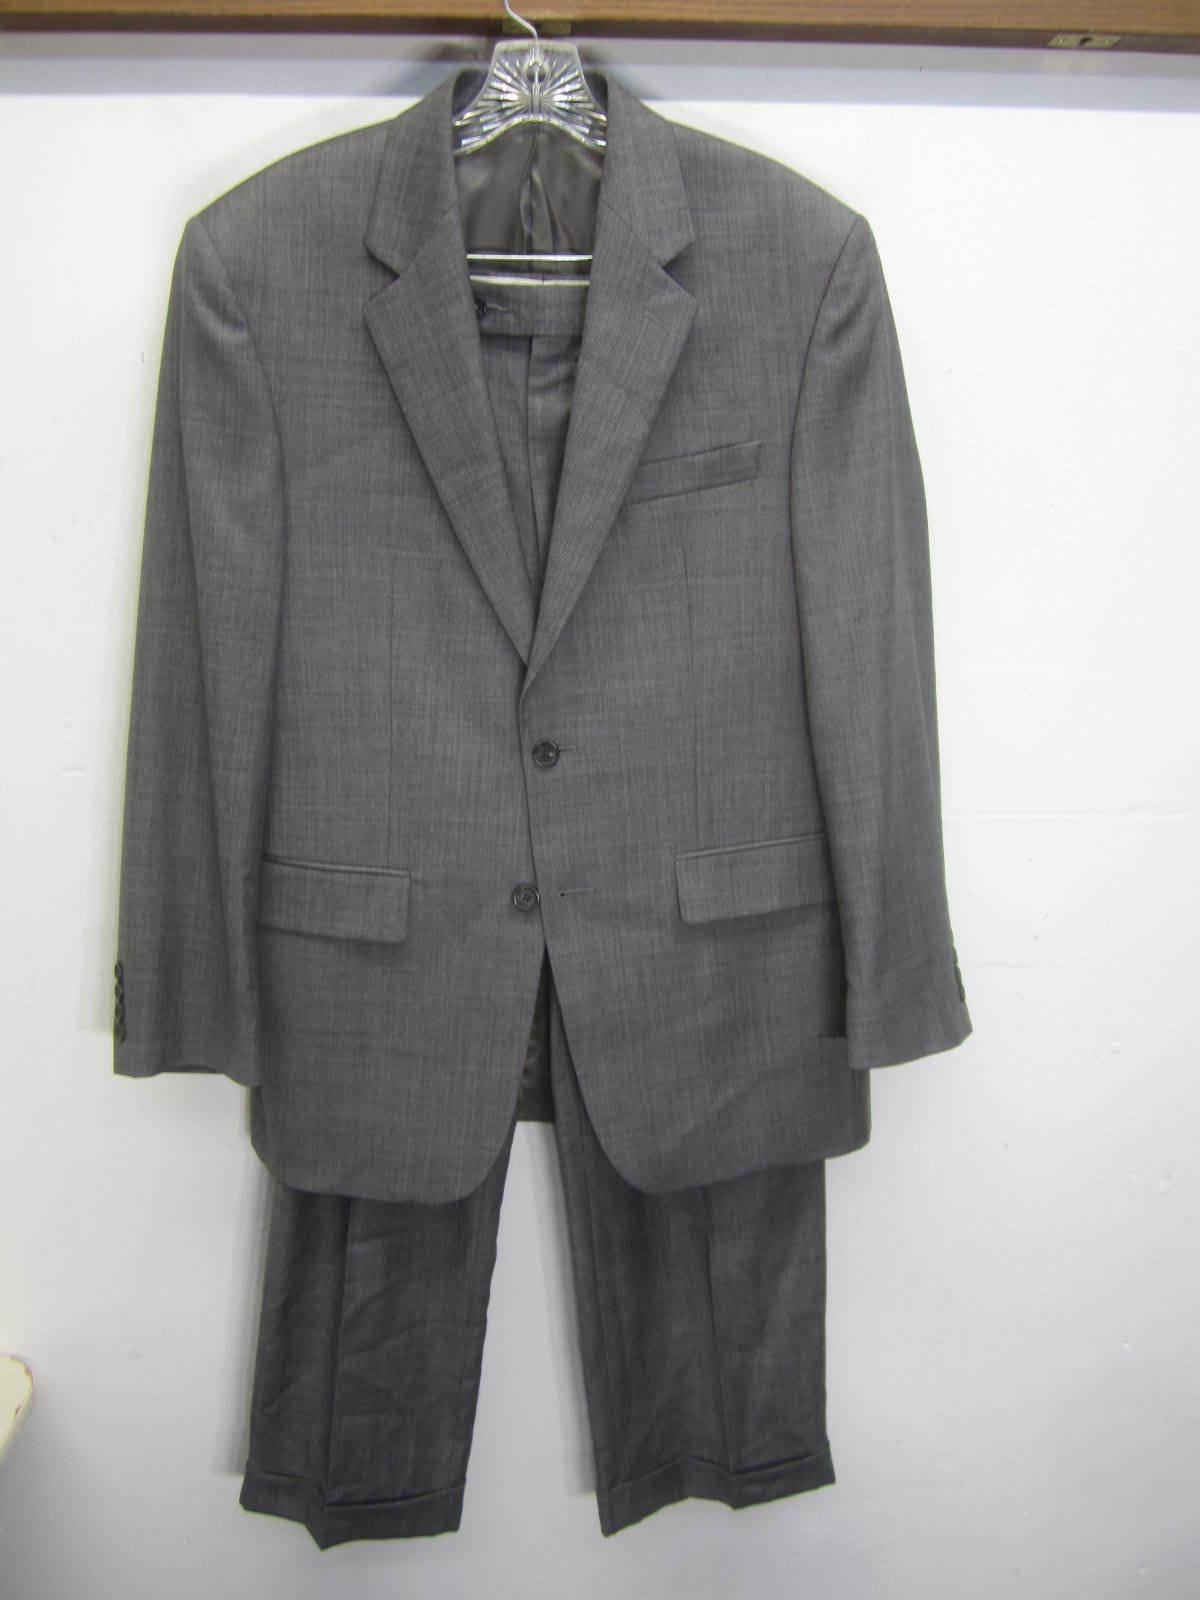 New Chaps Suit Blazer & Pants pleated grau wool NWOT two button sz 38R 32x30